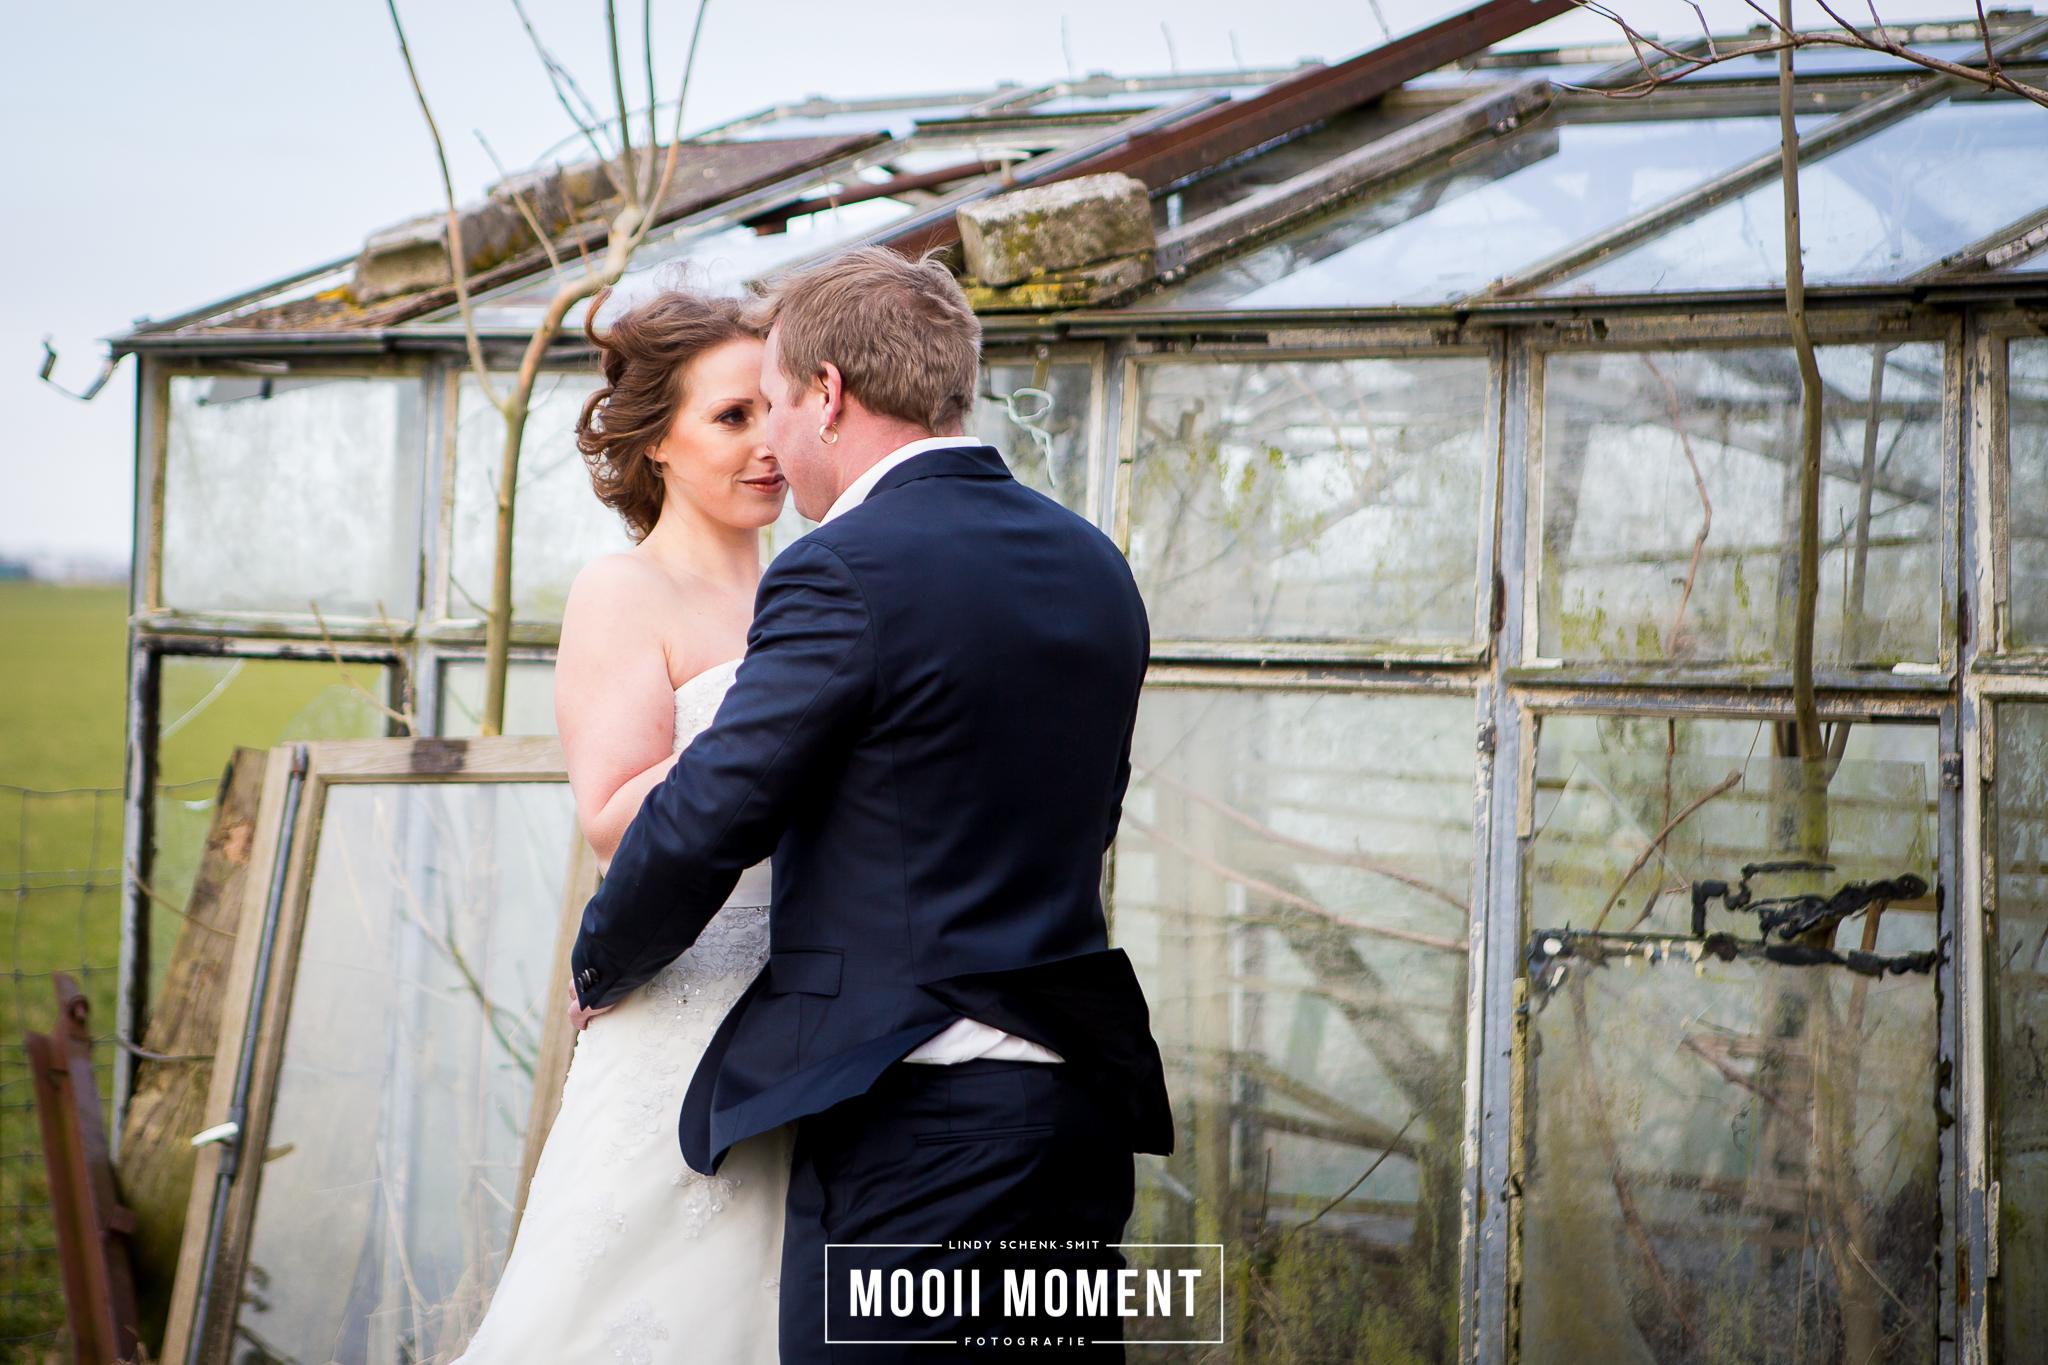 Bruidsreportage Kim & John 17-03-2018 || De fabriek Zuidermeer